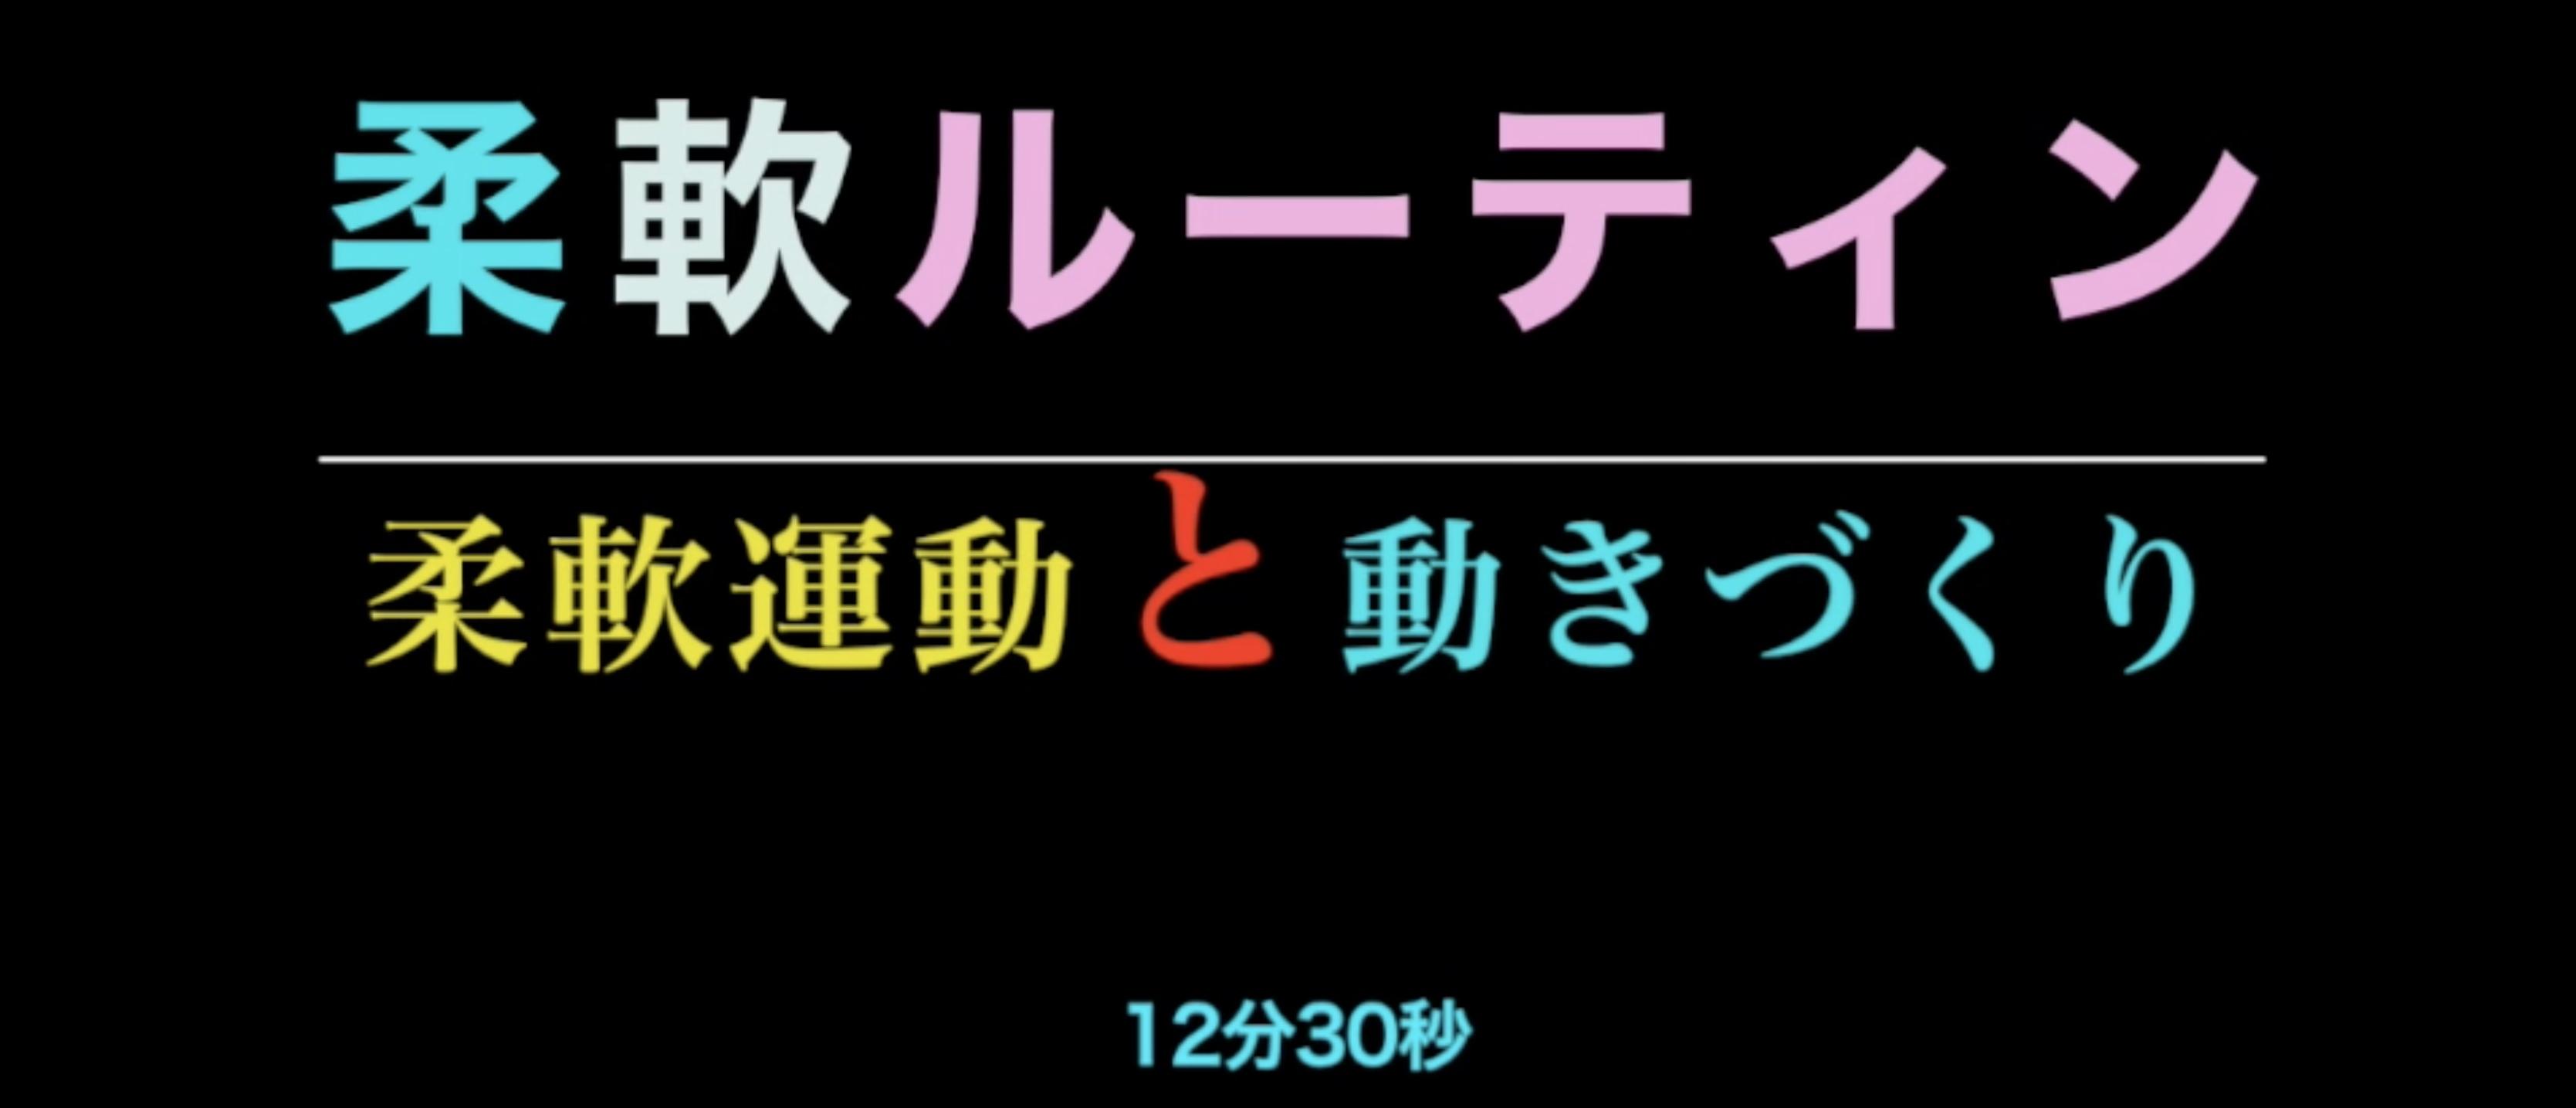 第2906話・・・バレー塾 味方_c0000970_08475598.jpg